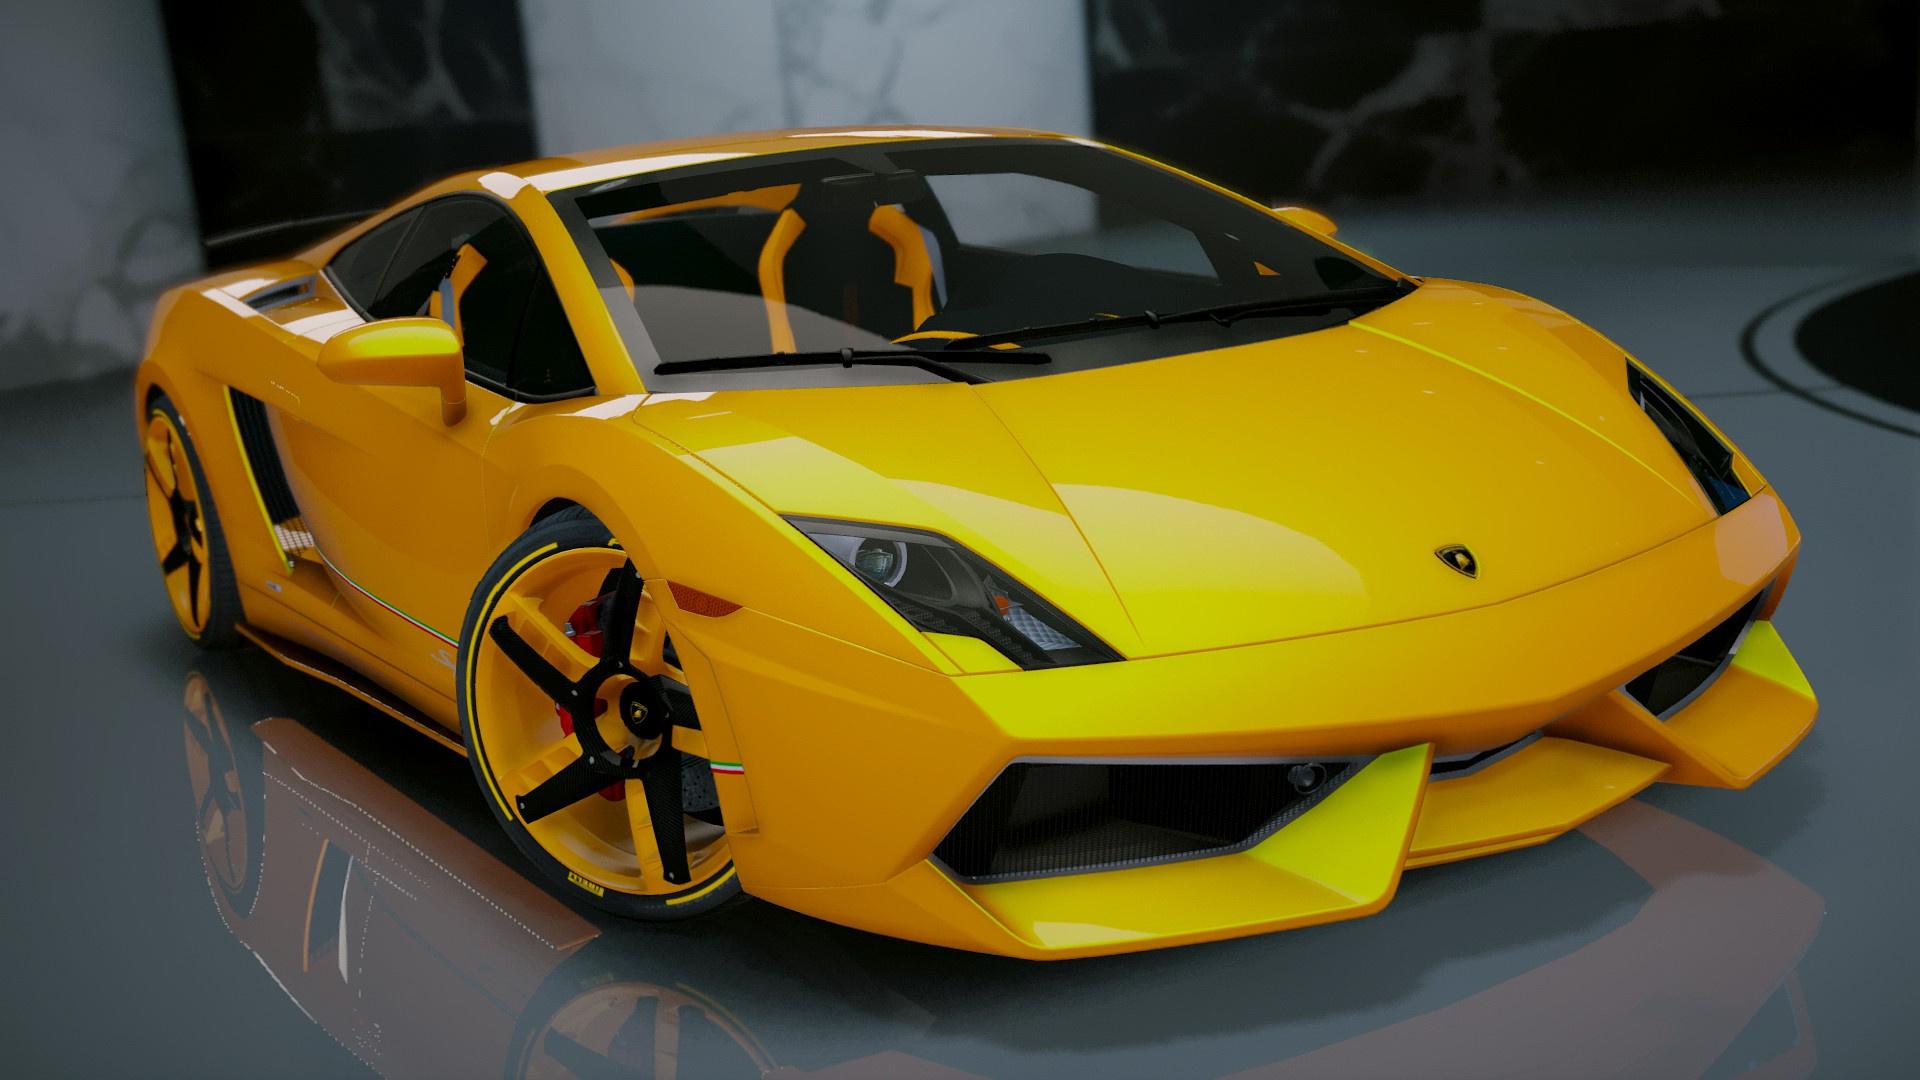 Gta 5 Toyota Supra >> Lamborghini Gallardo LP570-4 Superleggera [Add-On | OIV] - GTA5-Mods.com